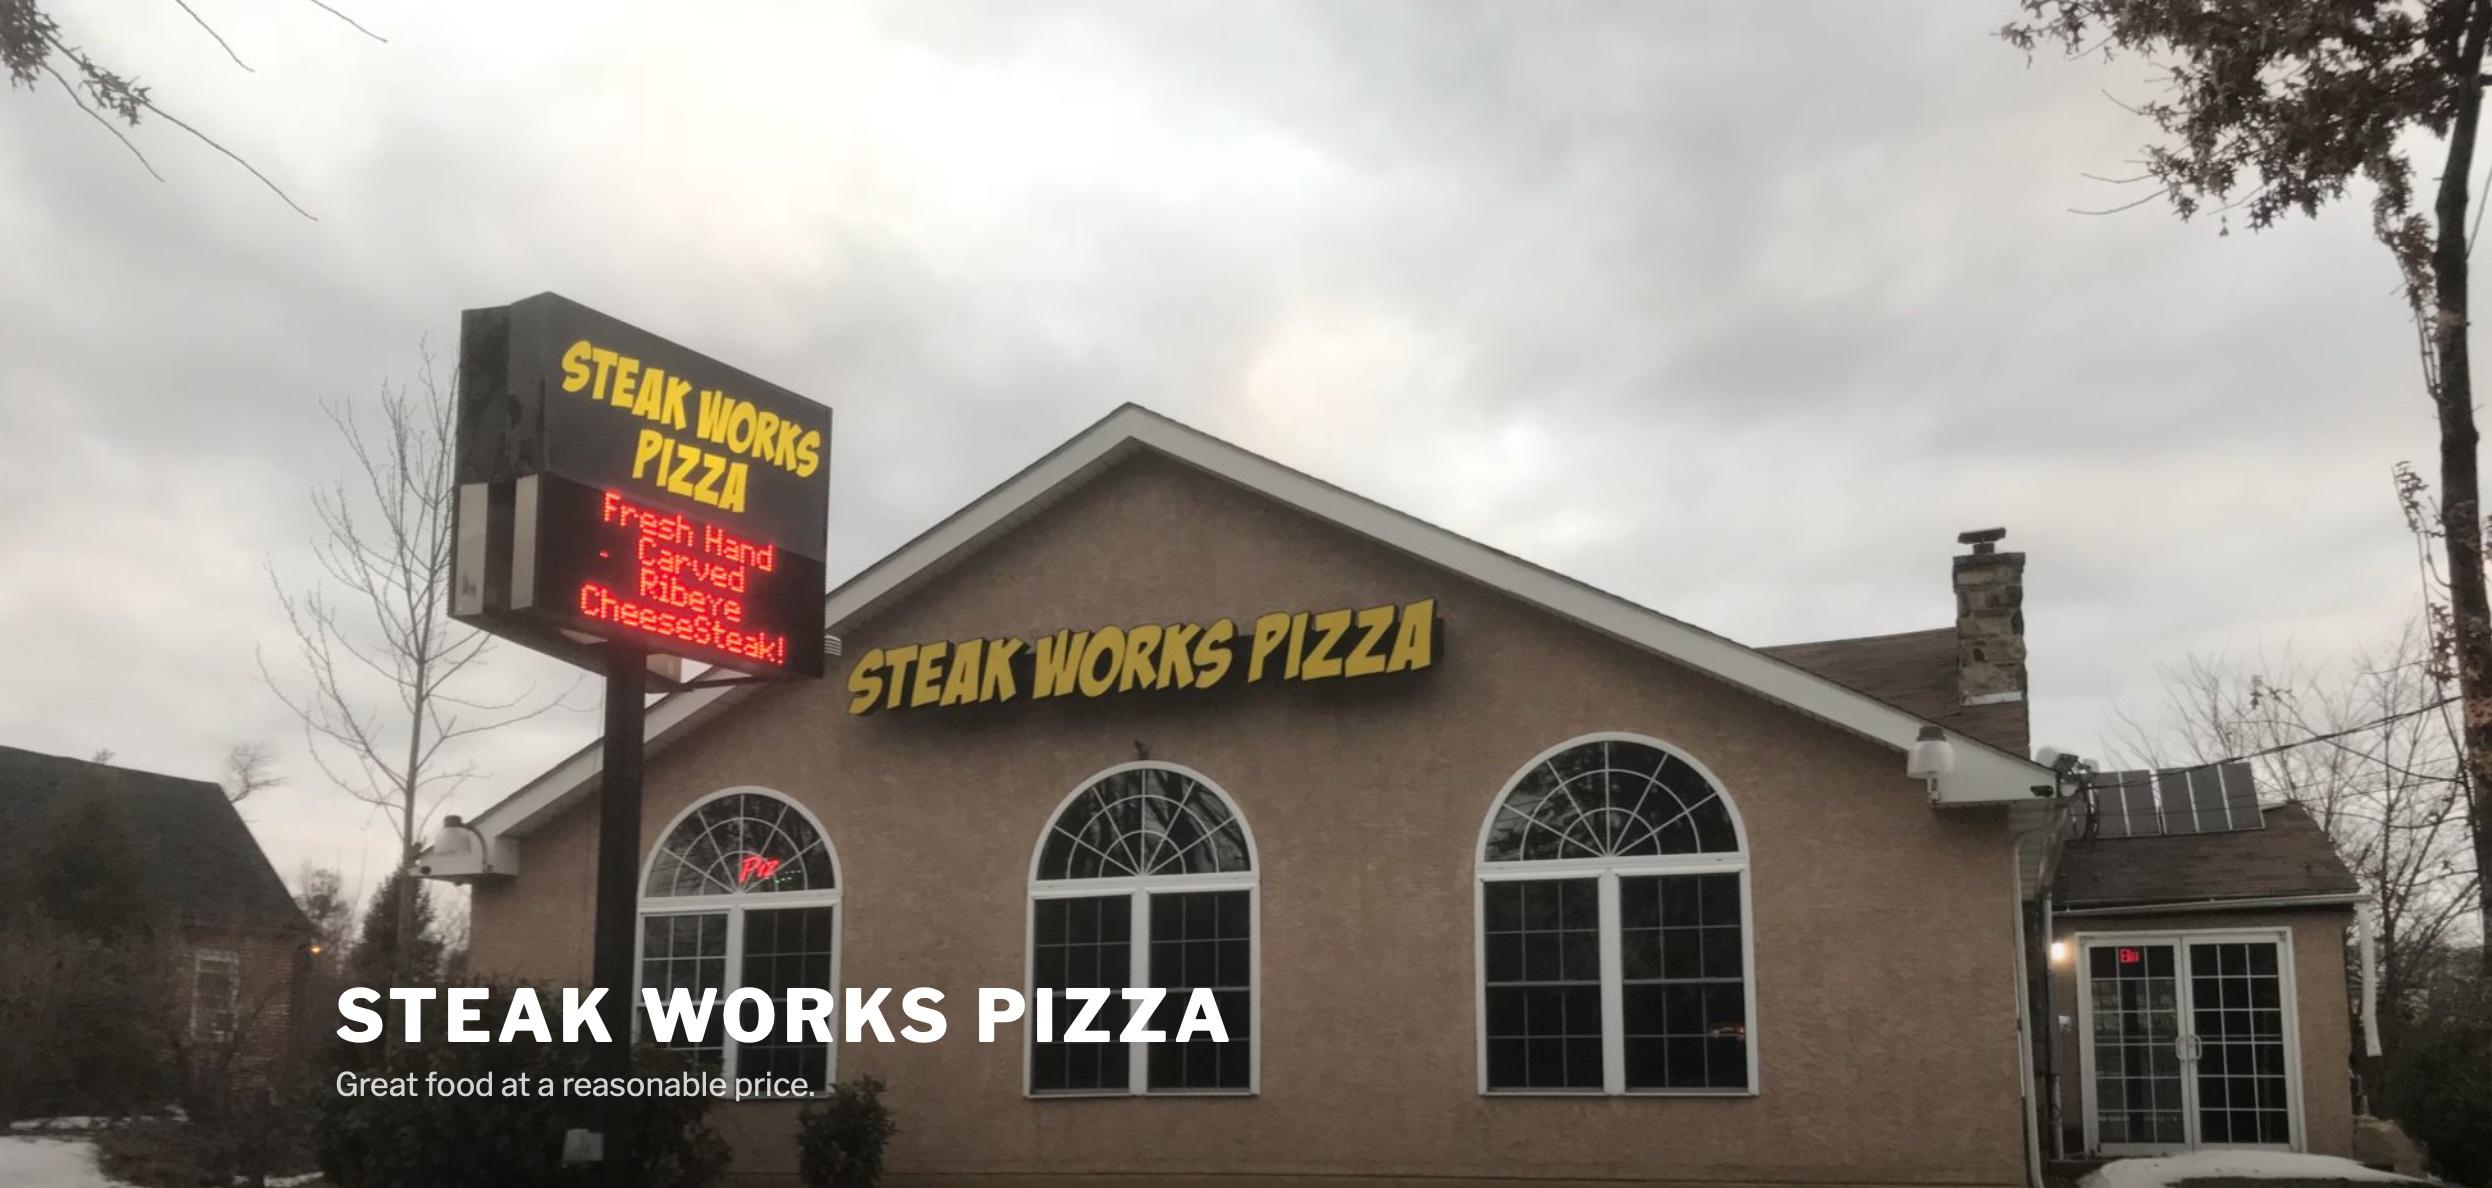 Steak Works Pizza (www.steakworkspizza.com)